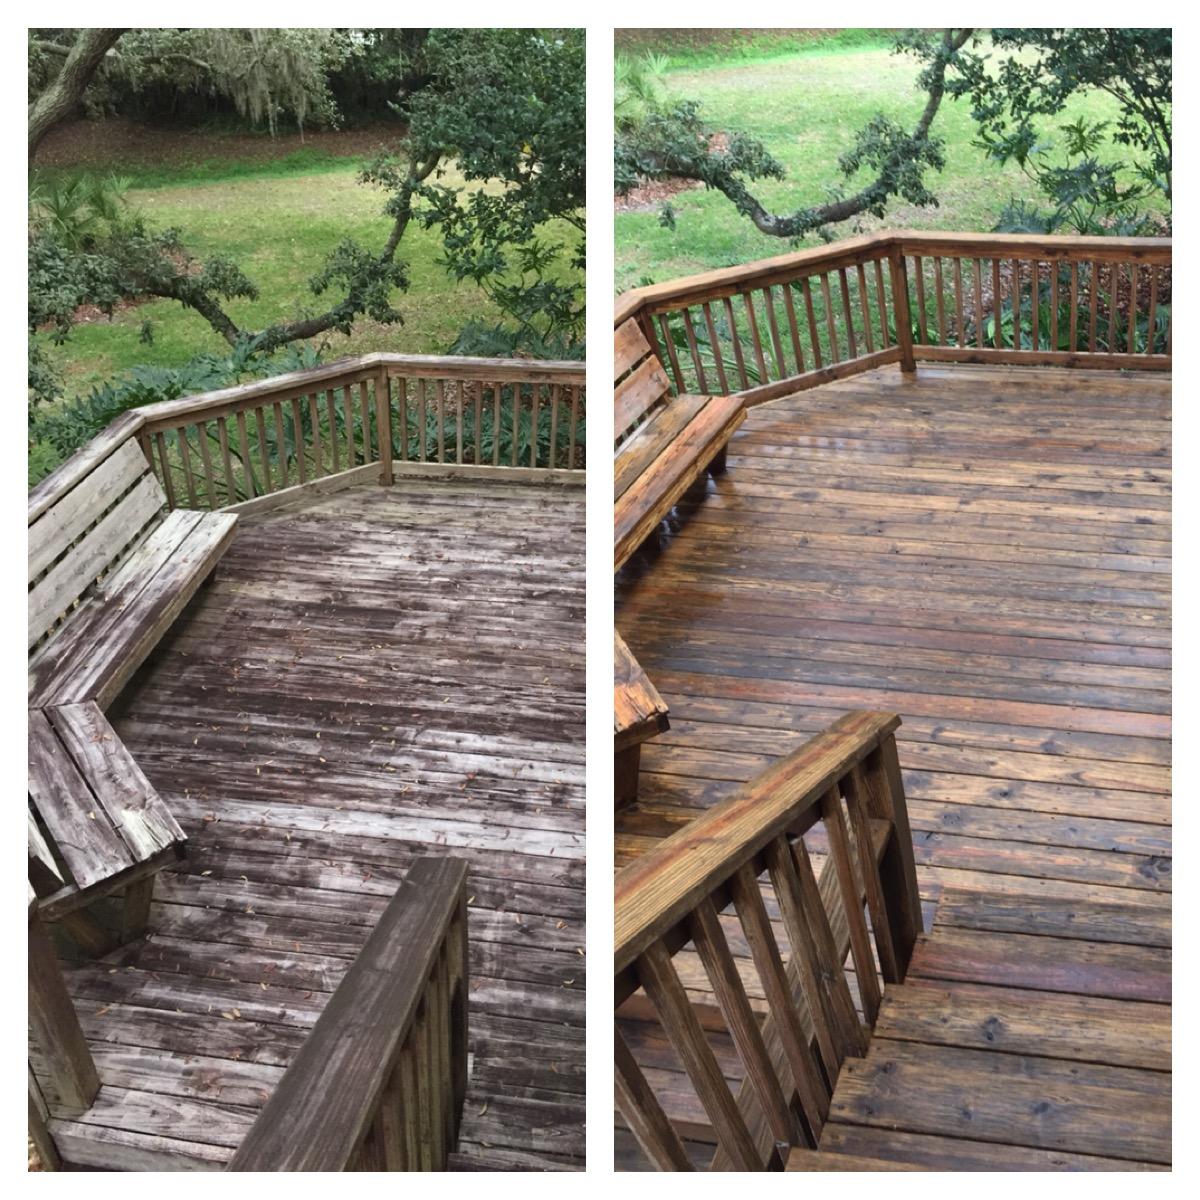 tampa pressure washing wood decks www.tampabaypressurewashingservice.com